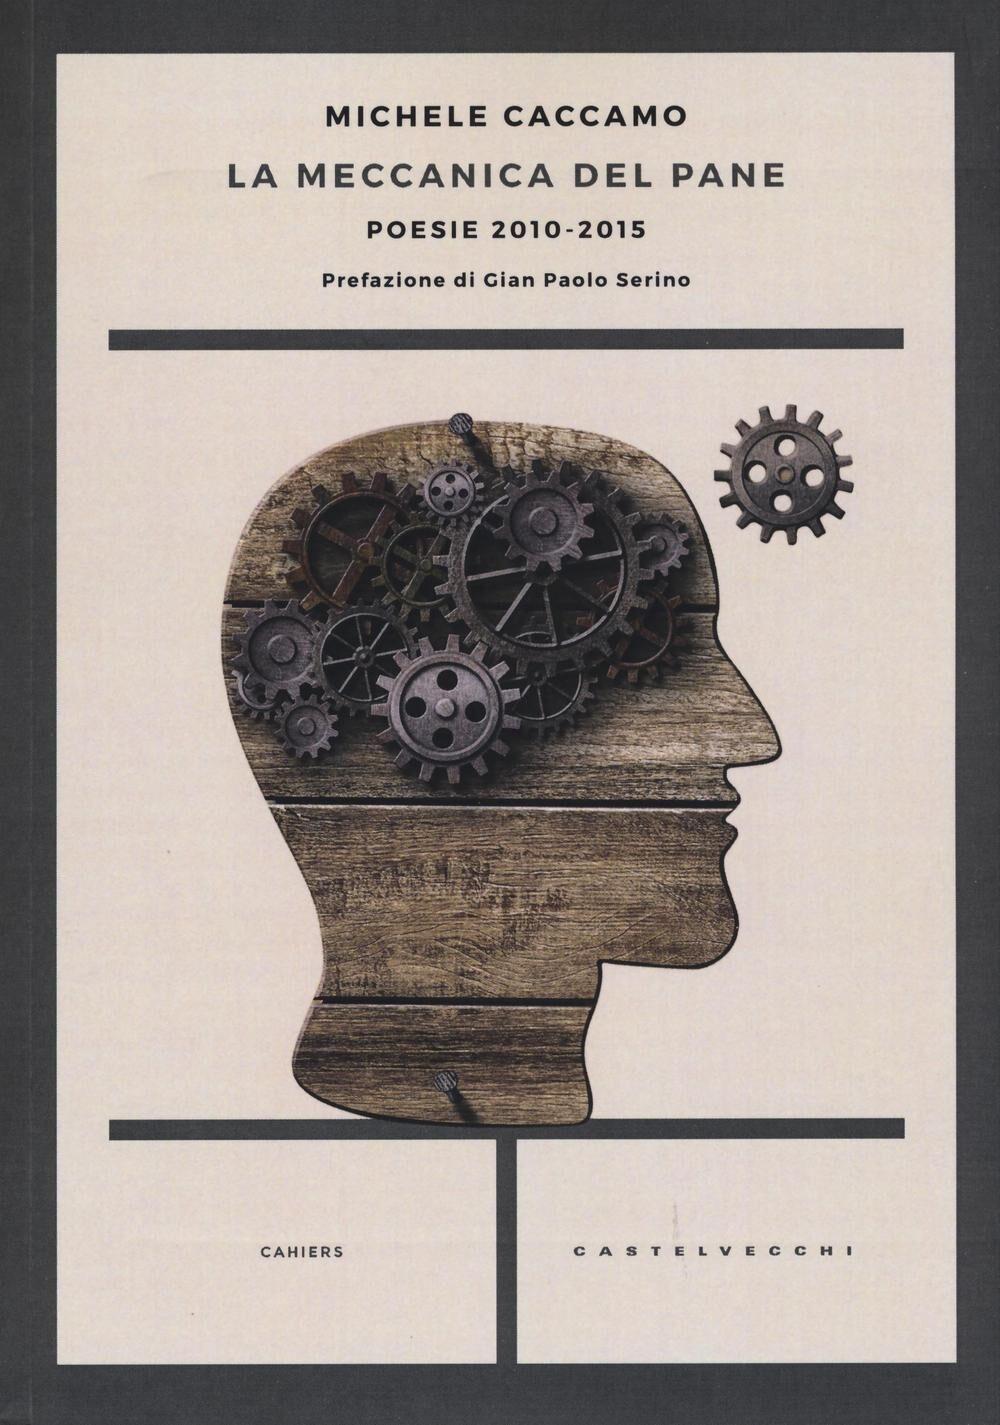 La meccanica del pane. Poesie 2010-2015